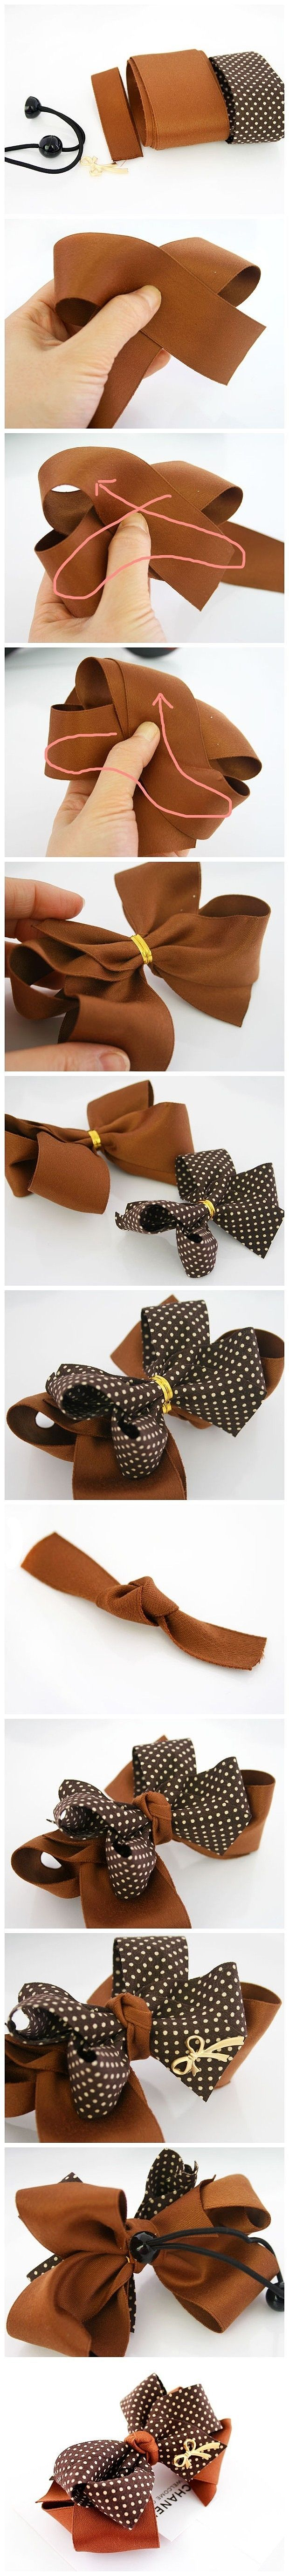 DIY Chanel Inspired Bow bows diy crafts home made easy crafts craft idea crafts ideas diy ideas diy crafts diy idea do it yourself diy projects diy craft handmade hair bows